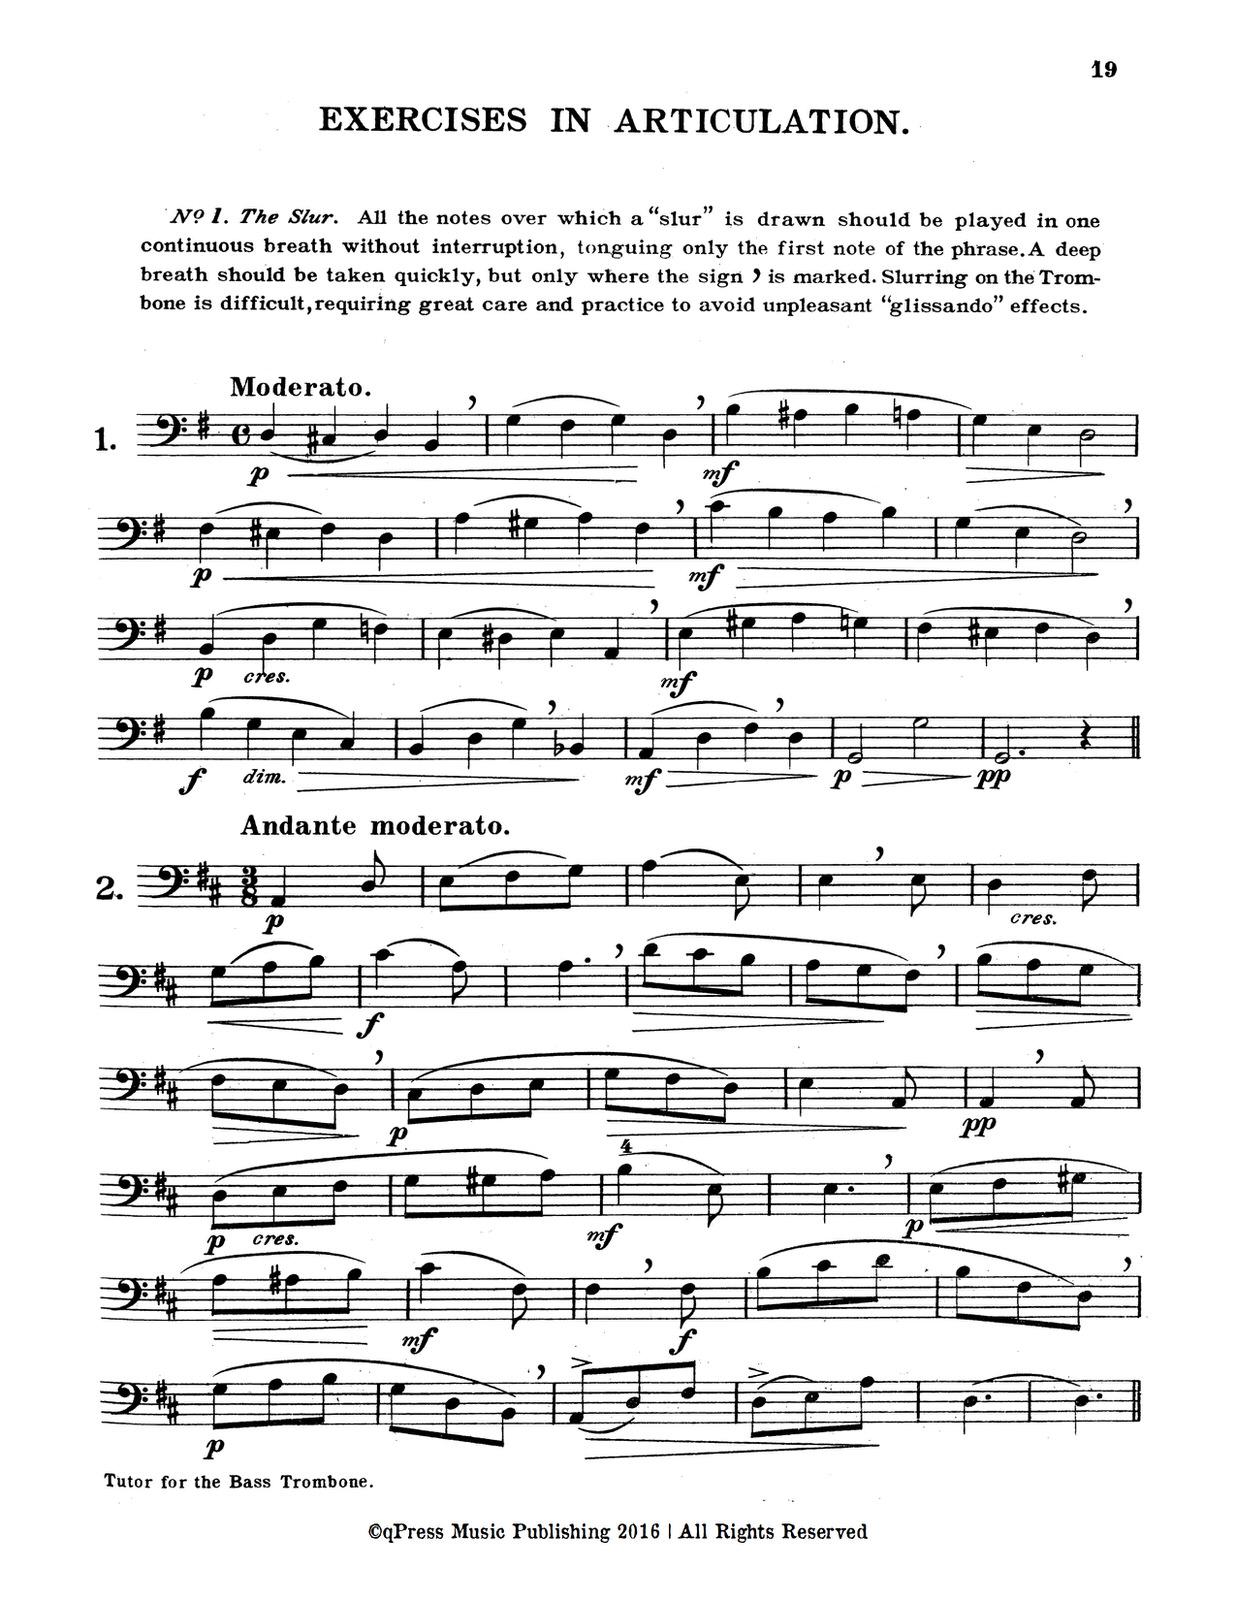 adkins-complete-modern-tutor-for-the-bass-trombone-4